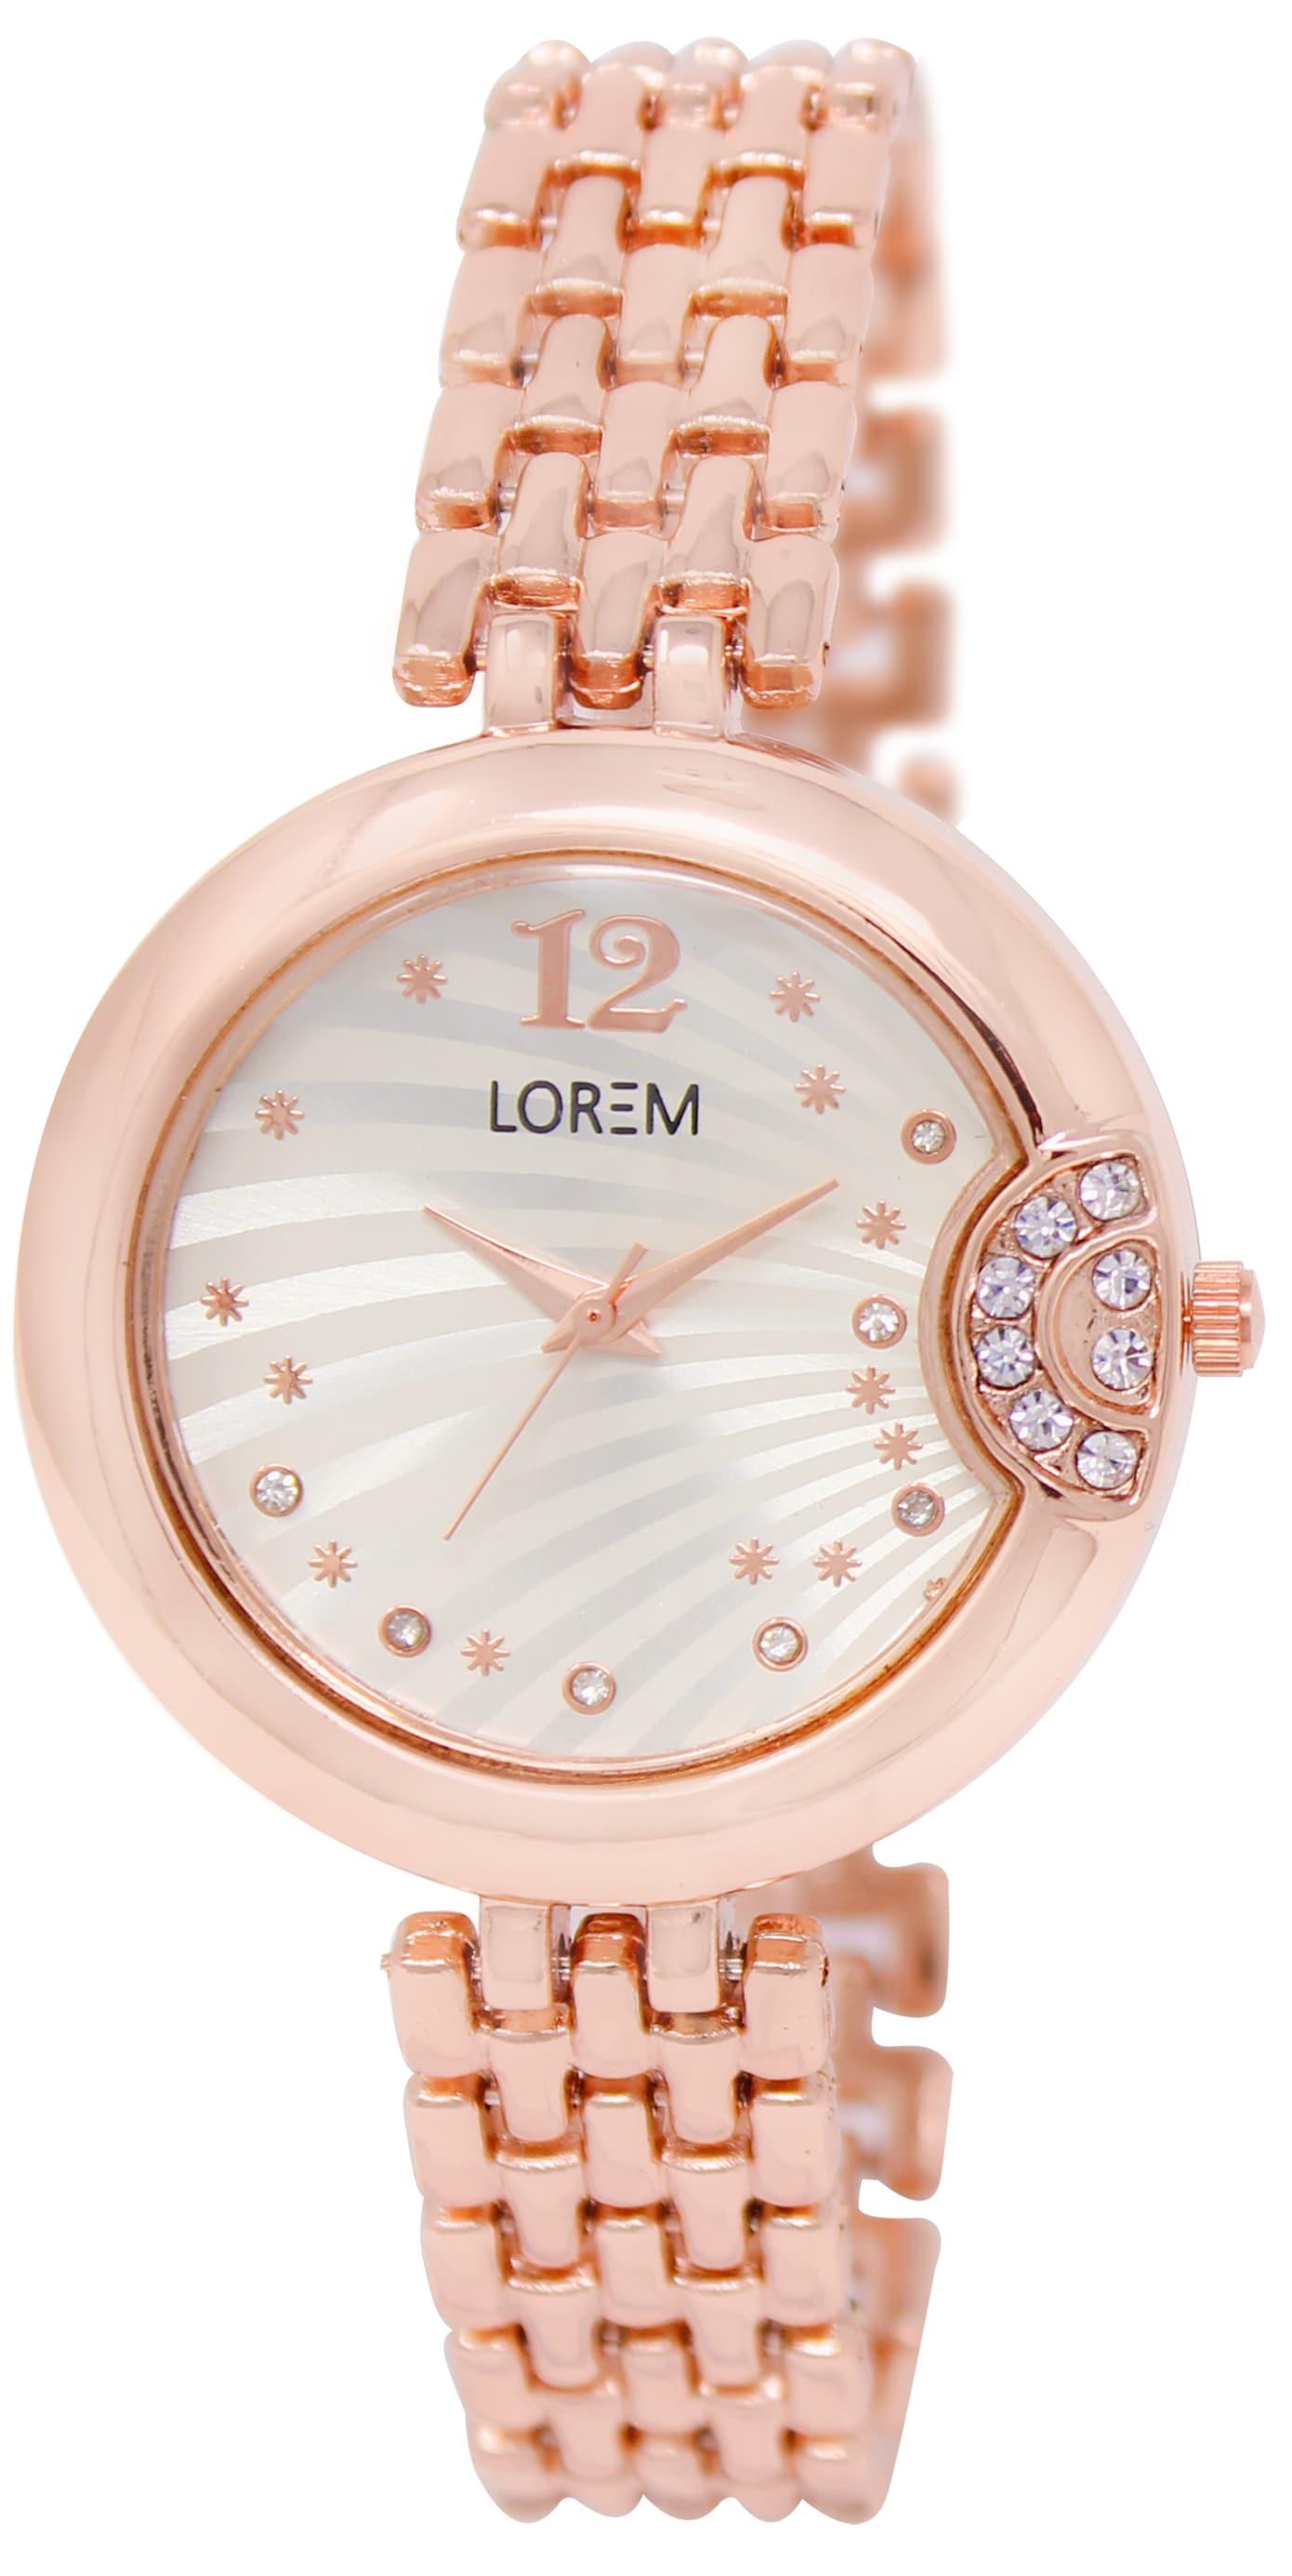 LOREM New Arrival White Round Girl's Metal Bracelet Watch - For Women & Girls